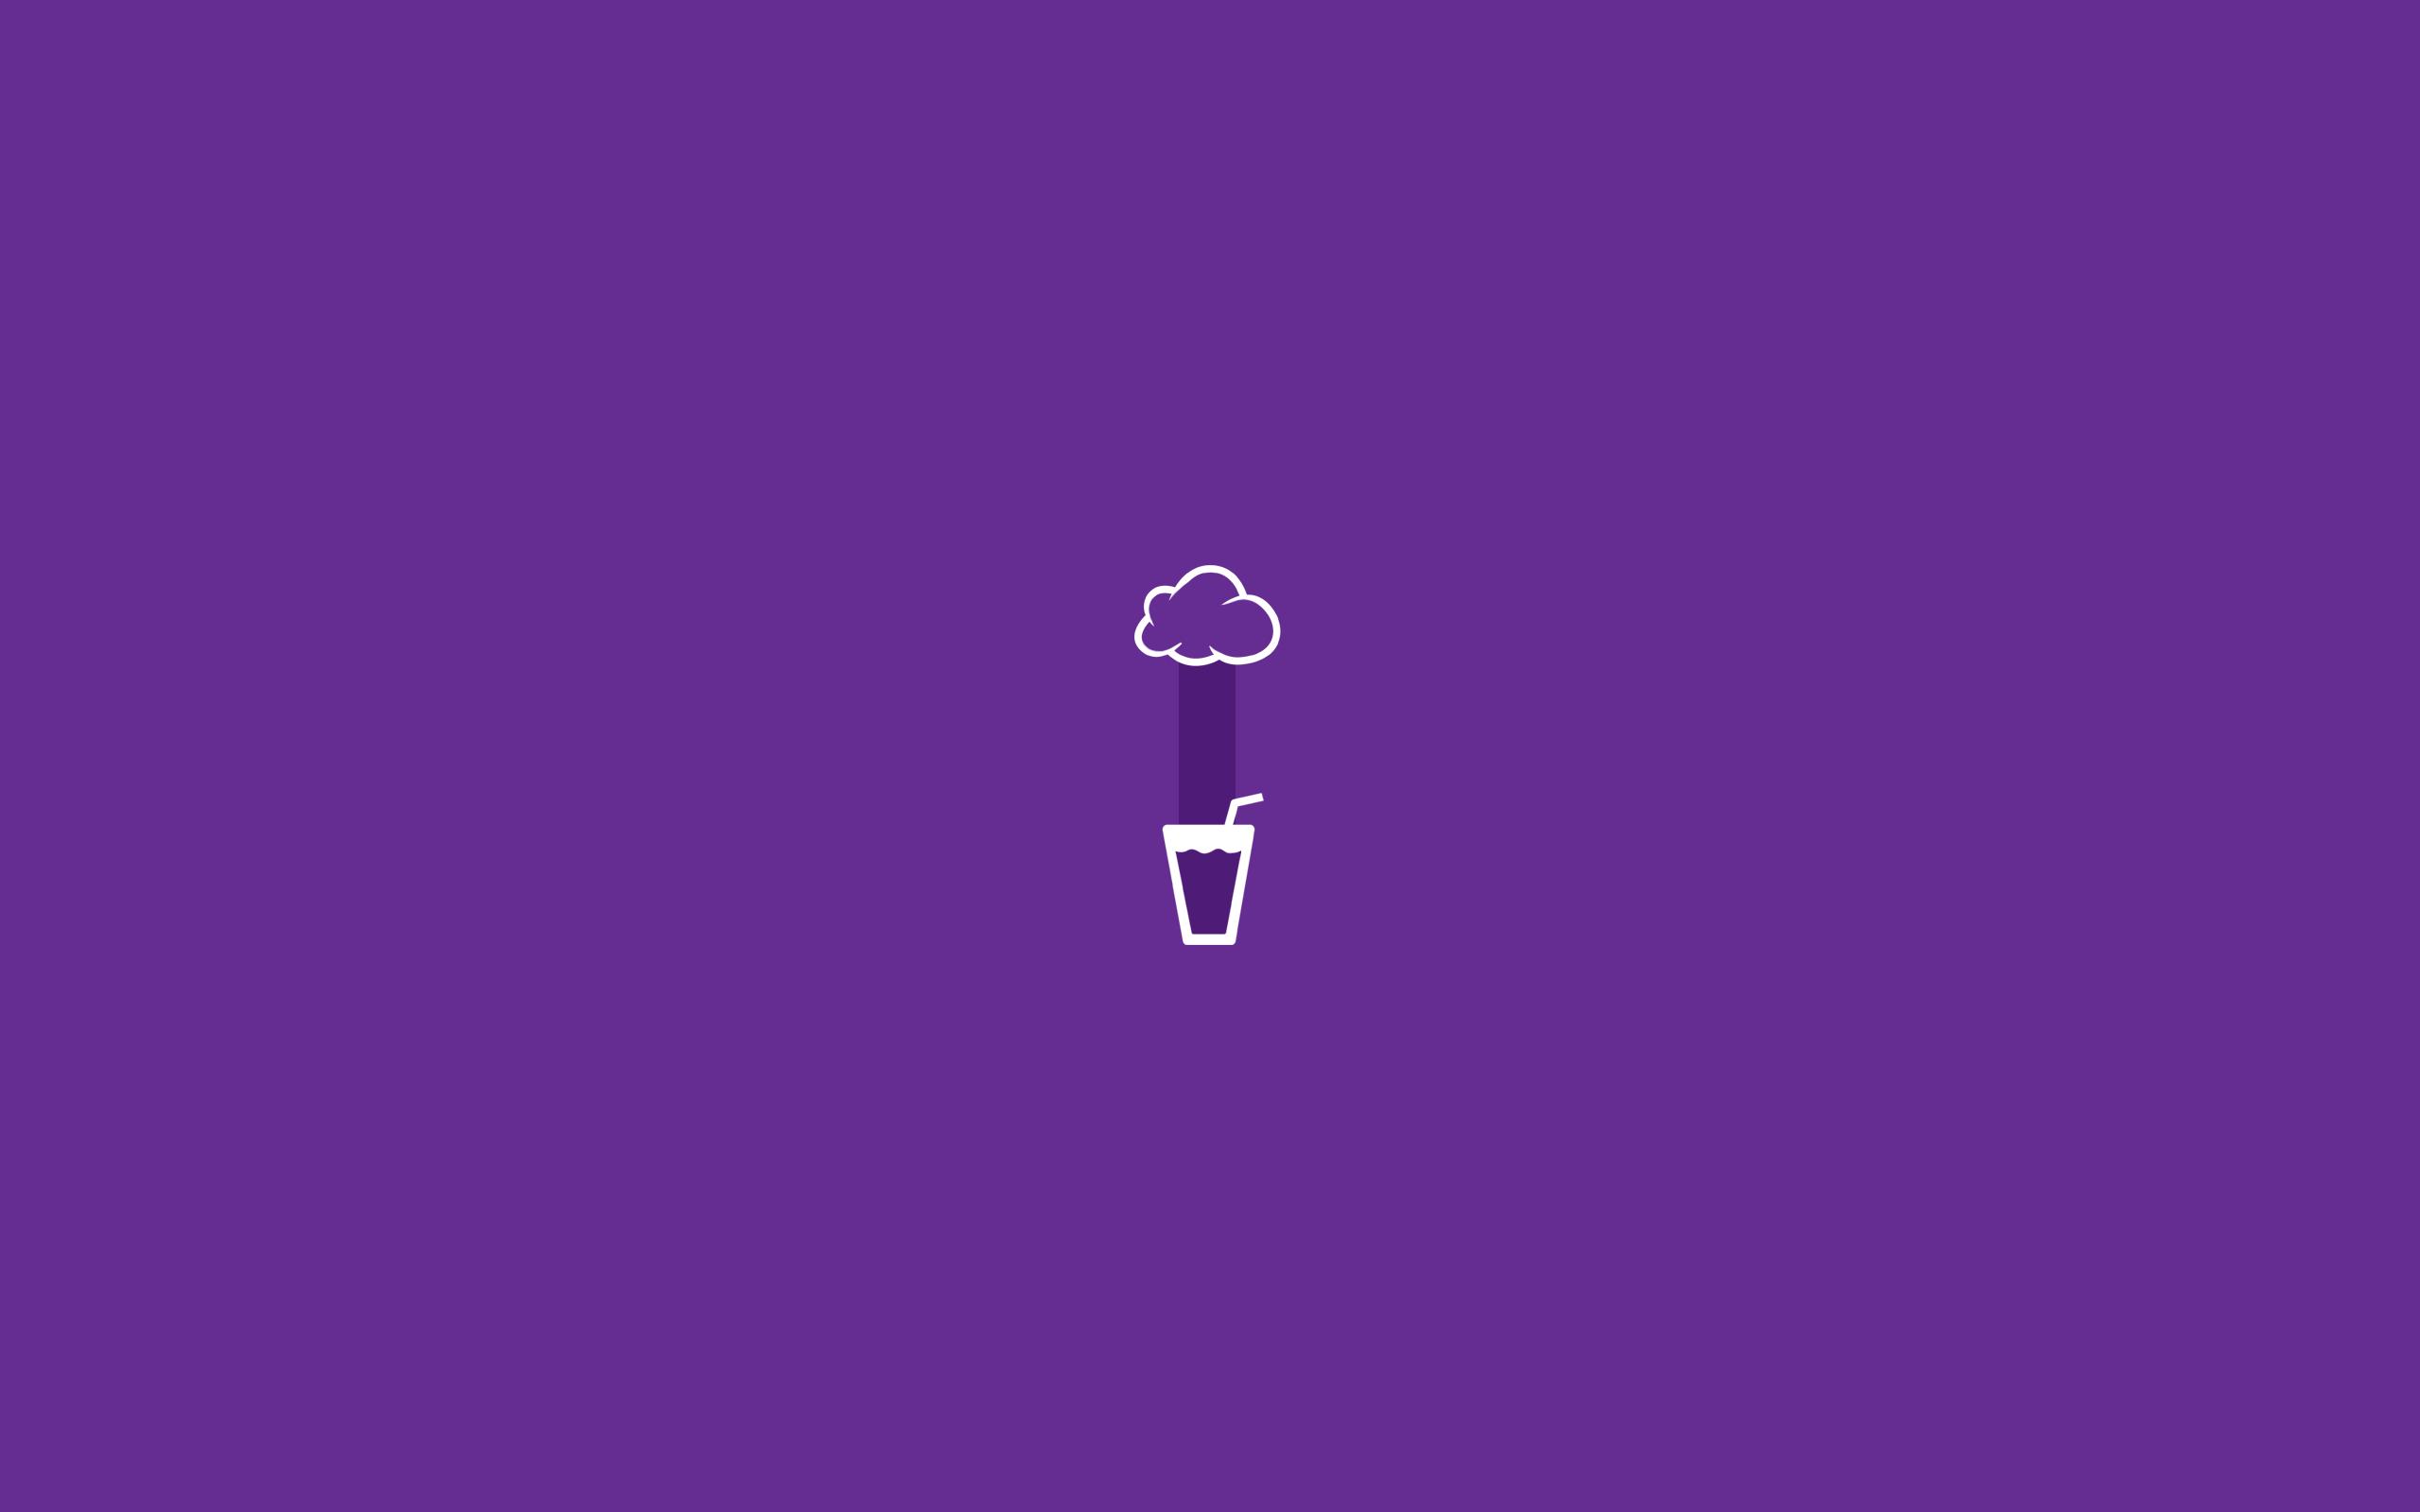 Minimalist Purple Wallpapers   Top Minimalist Purple 2560x1600